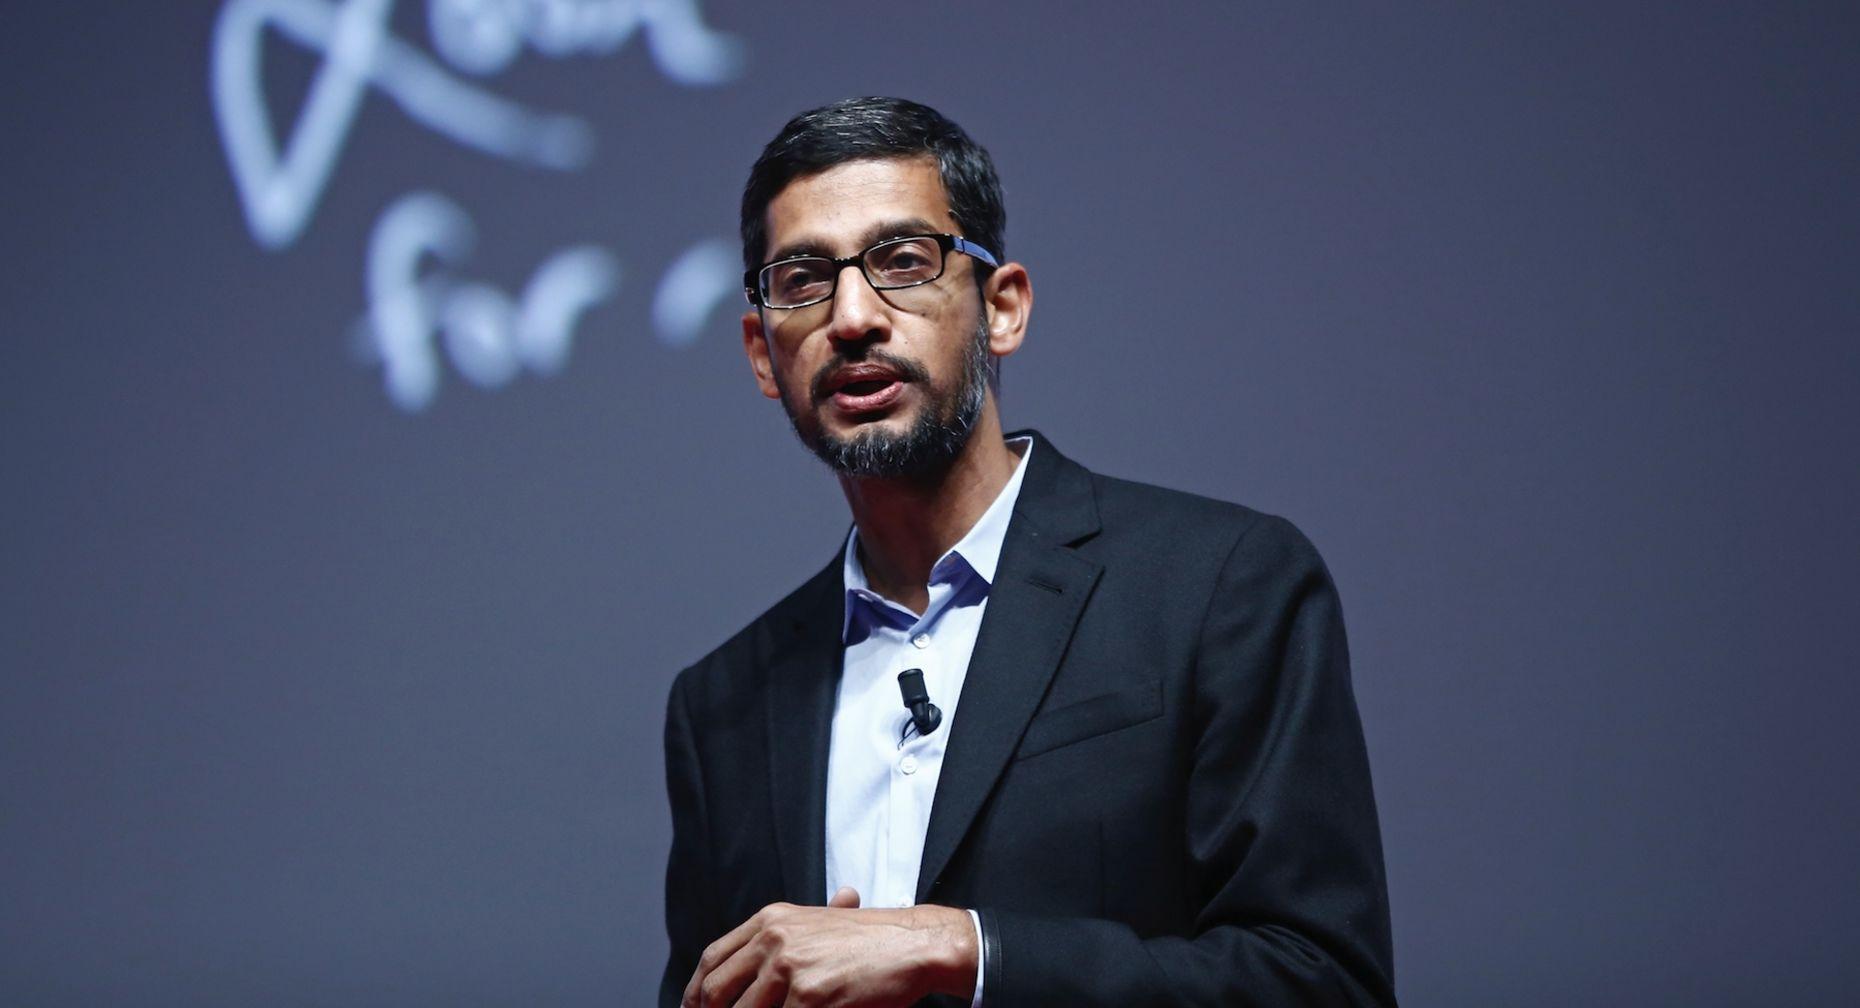 Google's No. 2 executive, Sundar Pichai, in Barcelona Monday. Photo by Bloomberg.